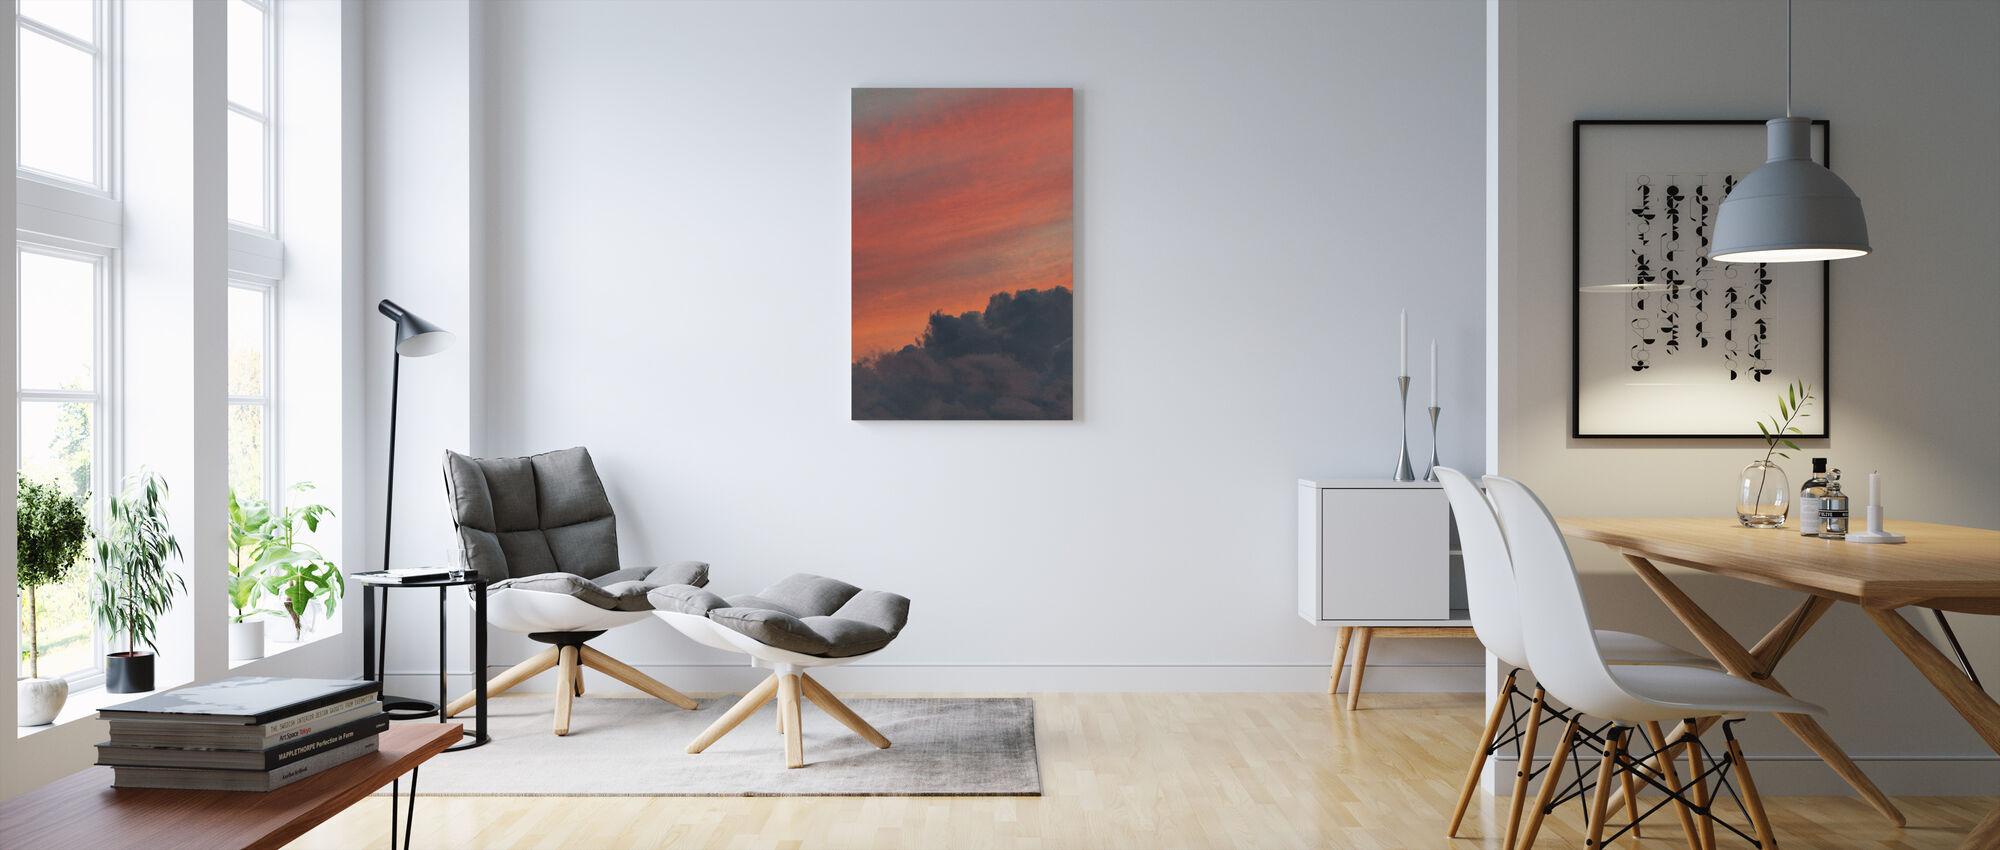 Orange Sky - Canvas print - Living Room